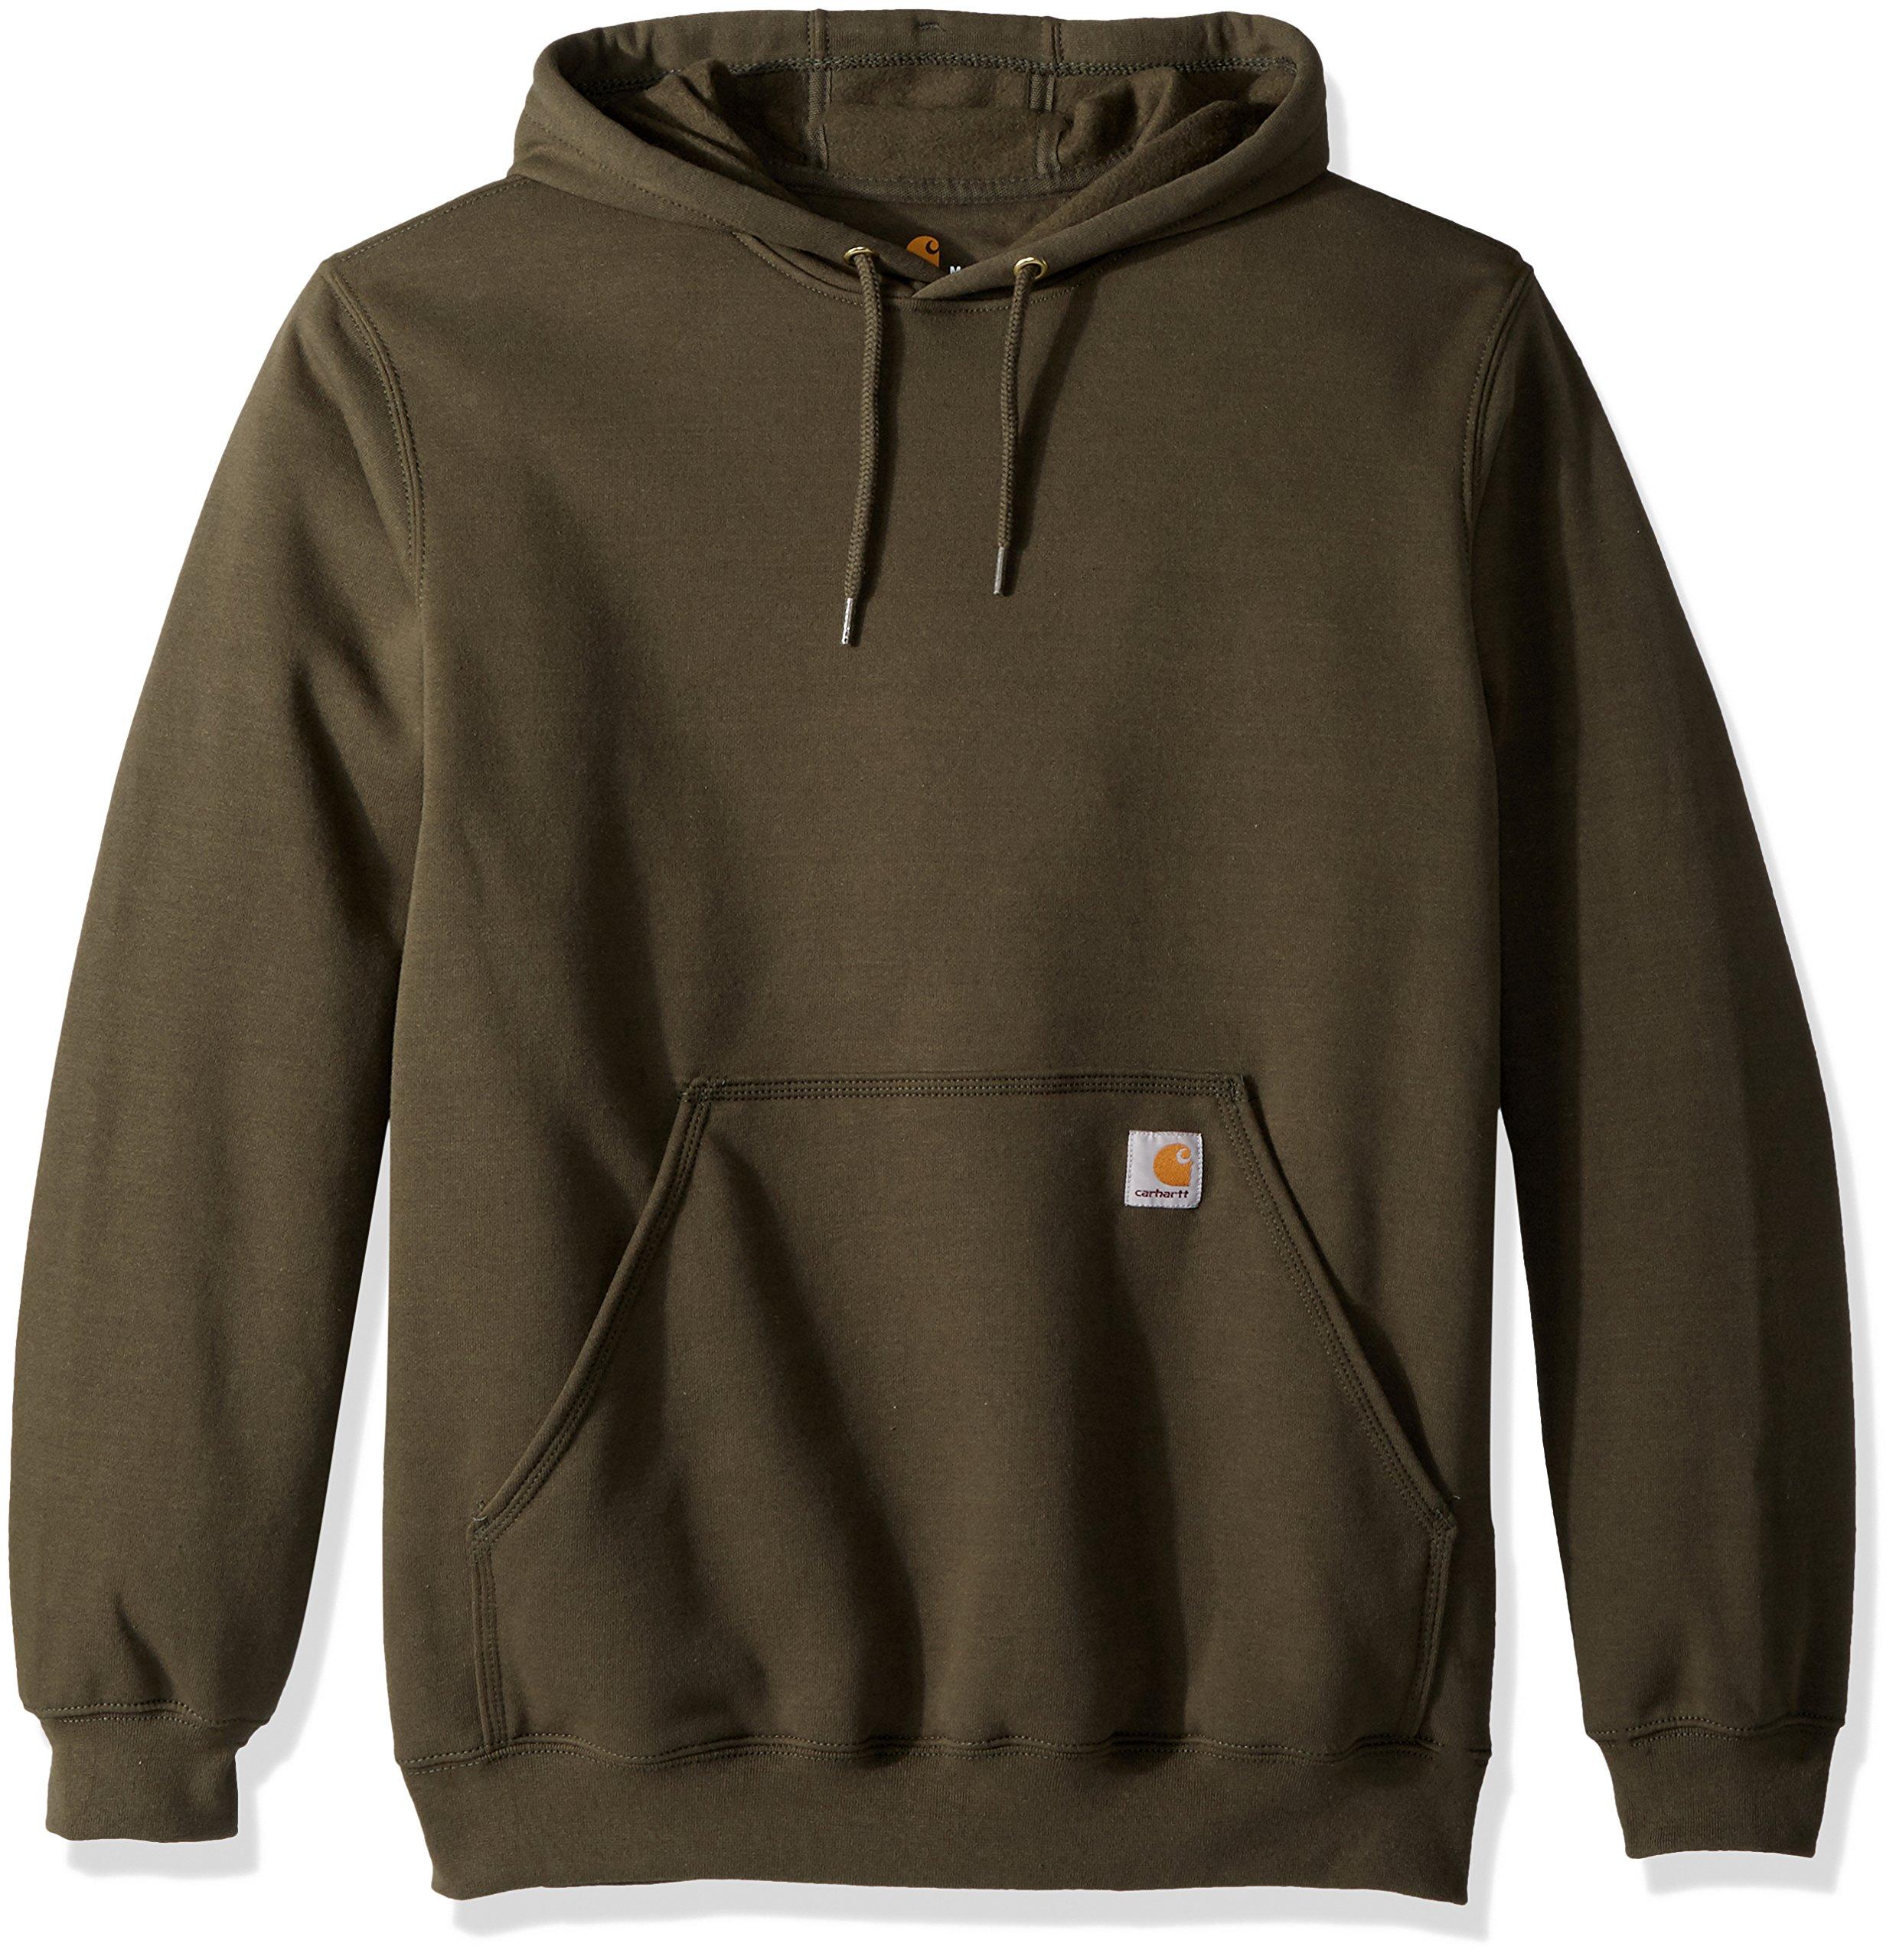 Carhartt Men's Midweight Original Fit Hooded Pullover Sweatshirt K121, Moss, Small